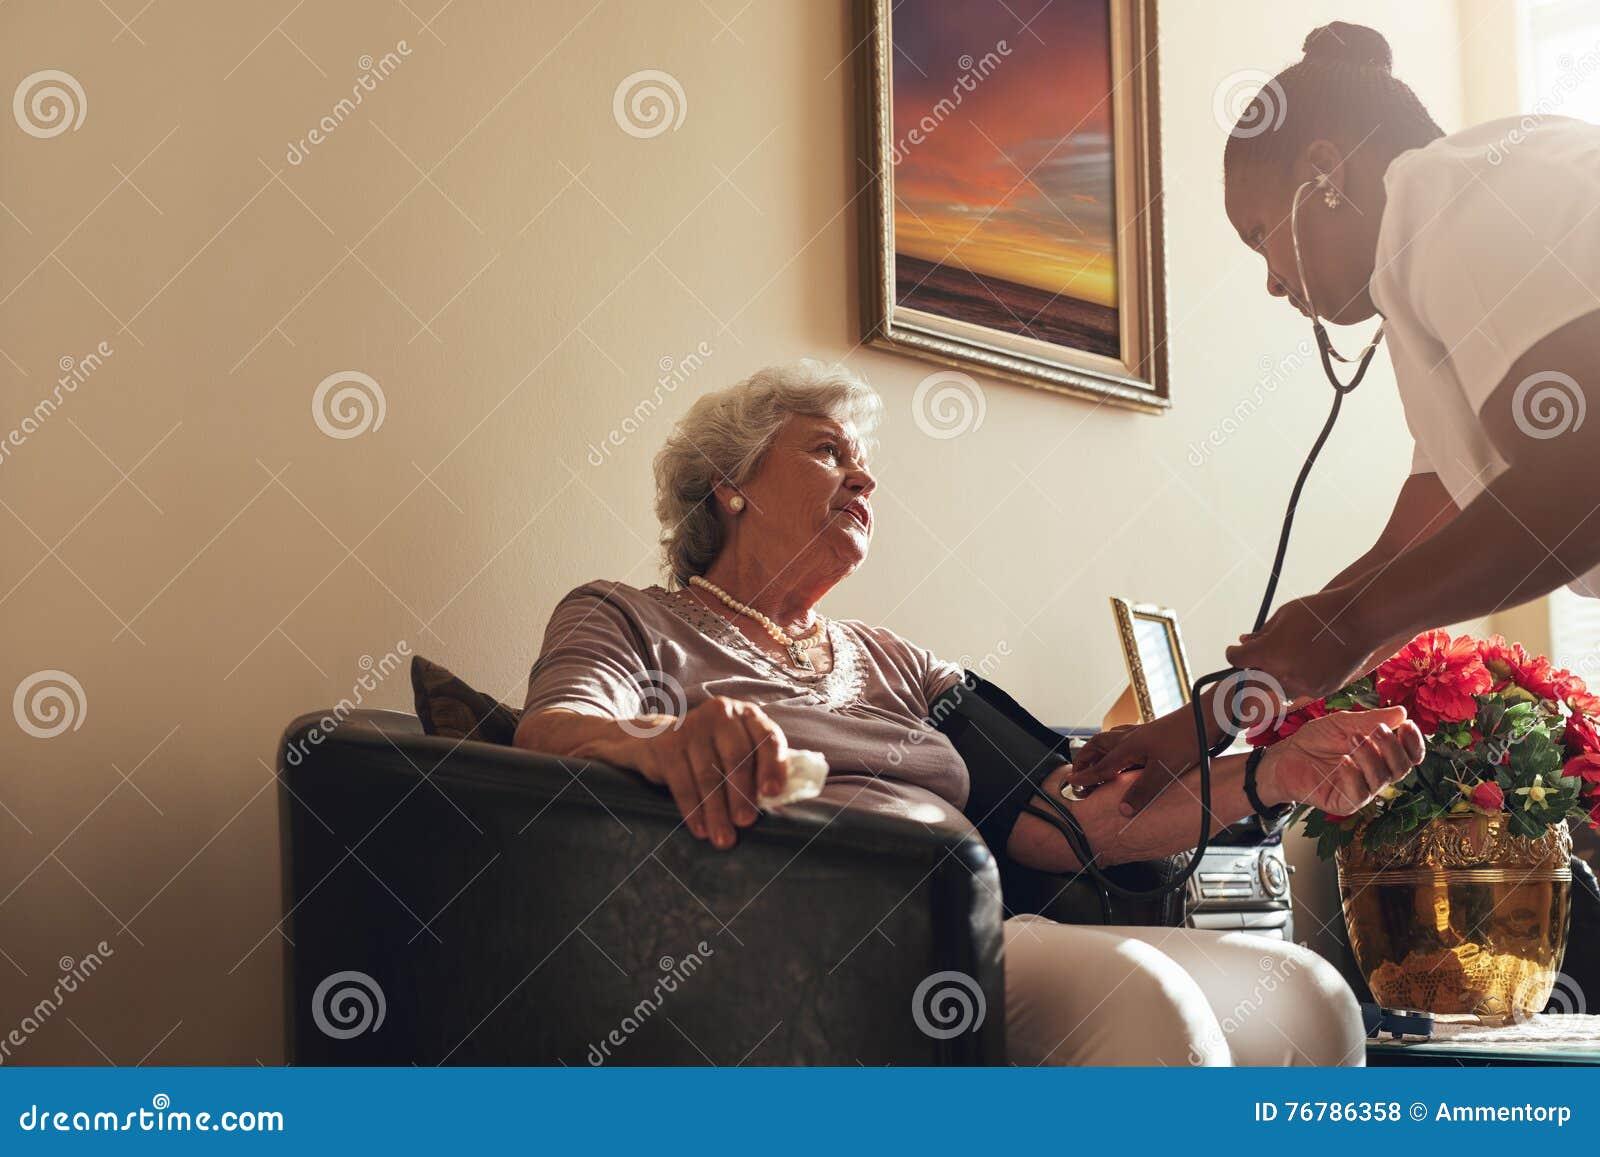 Home healthcare nurse checking blood pressure of senior woman